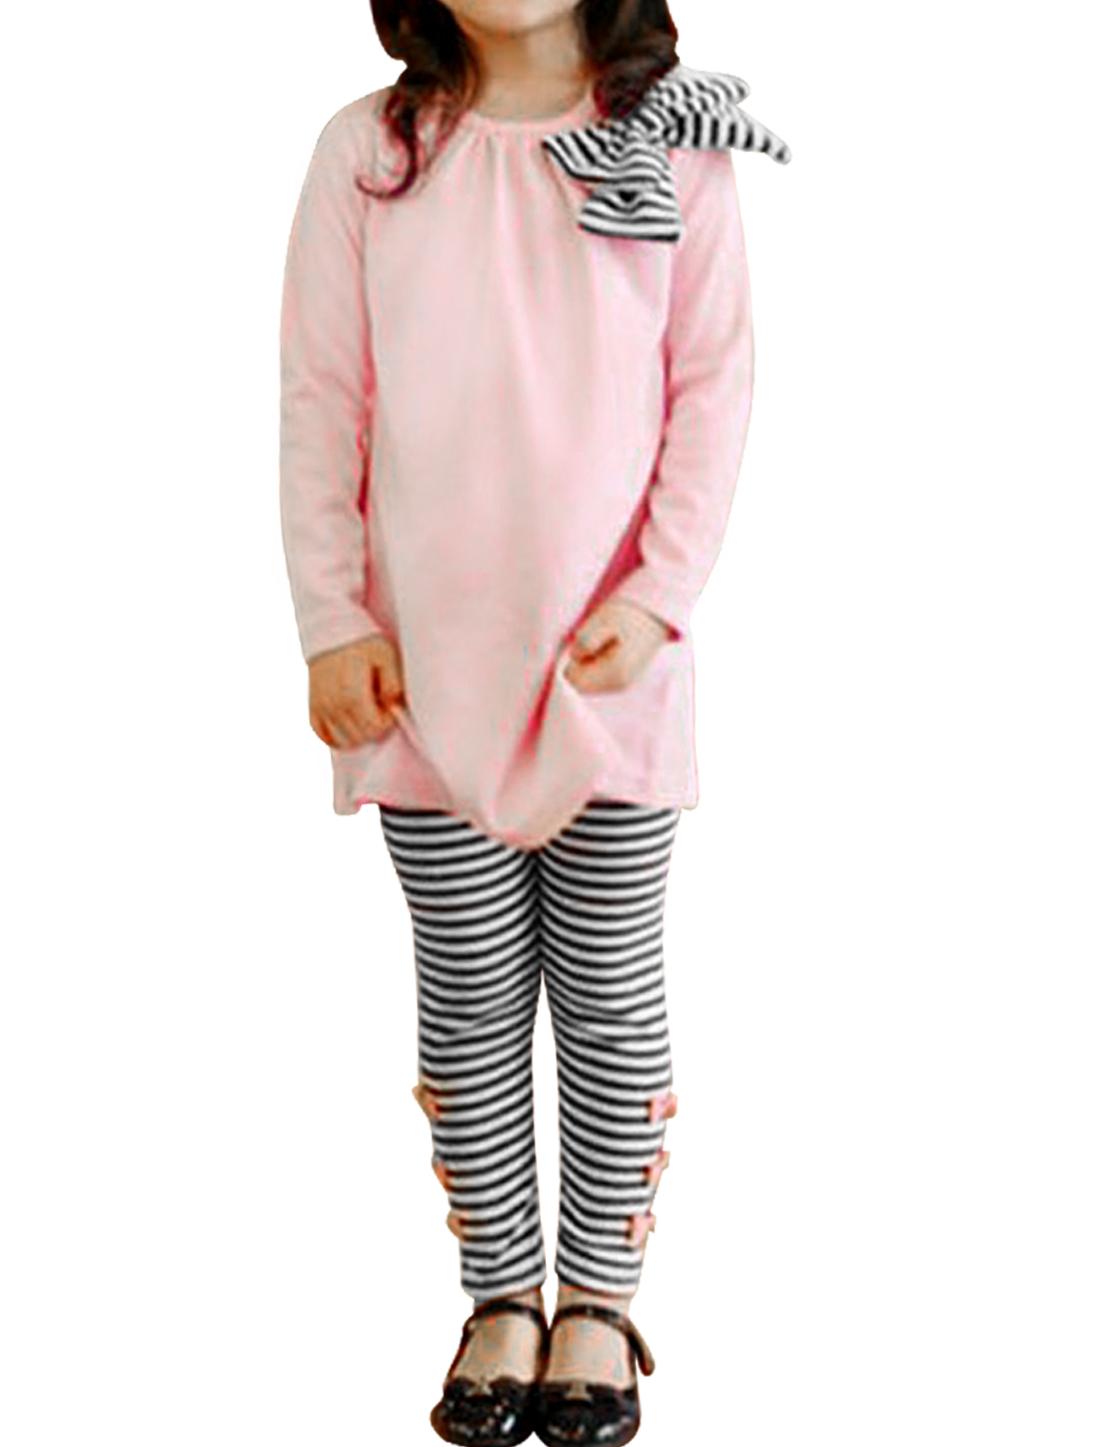 Girls Round Neck Shirt & Bowknot Decor Pants Pink Black 4T